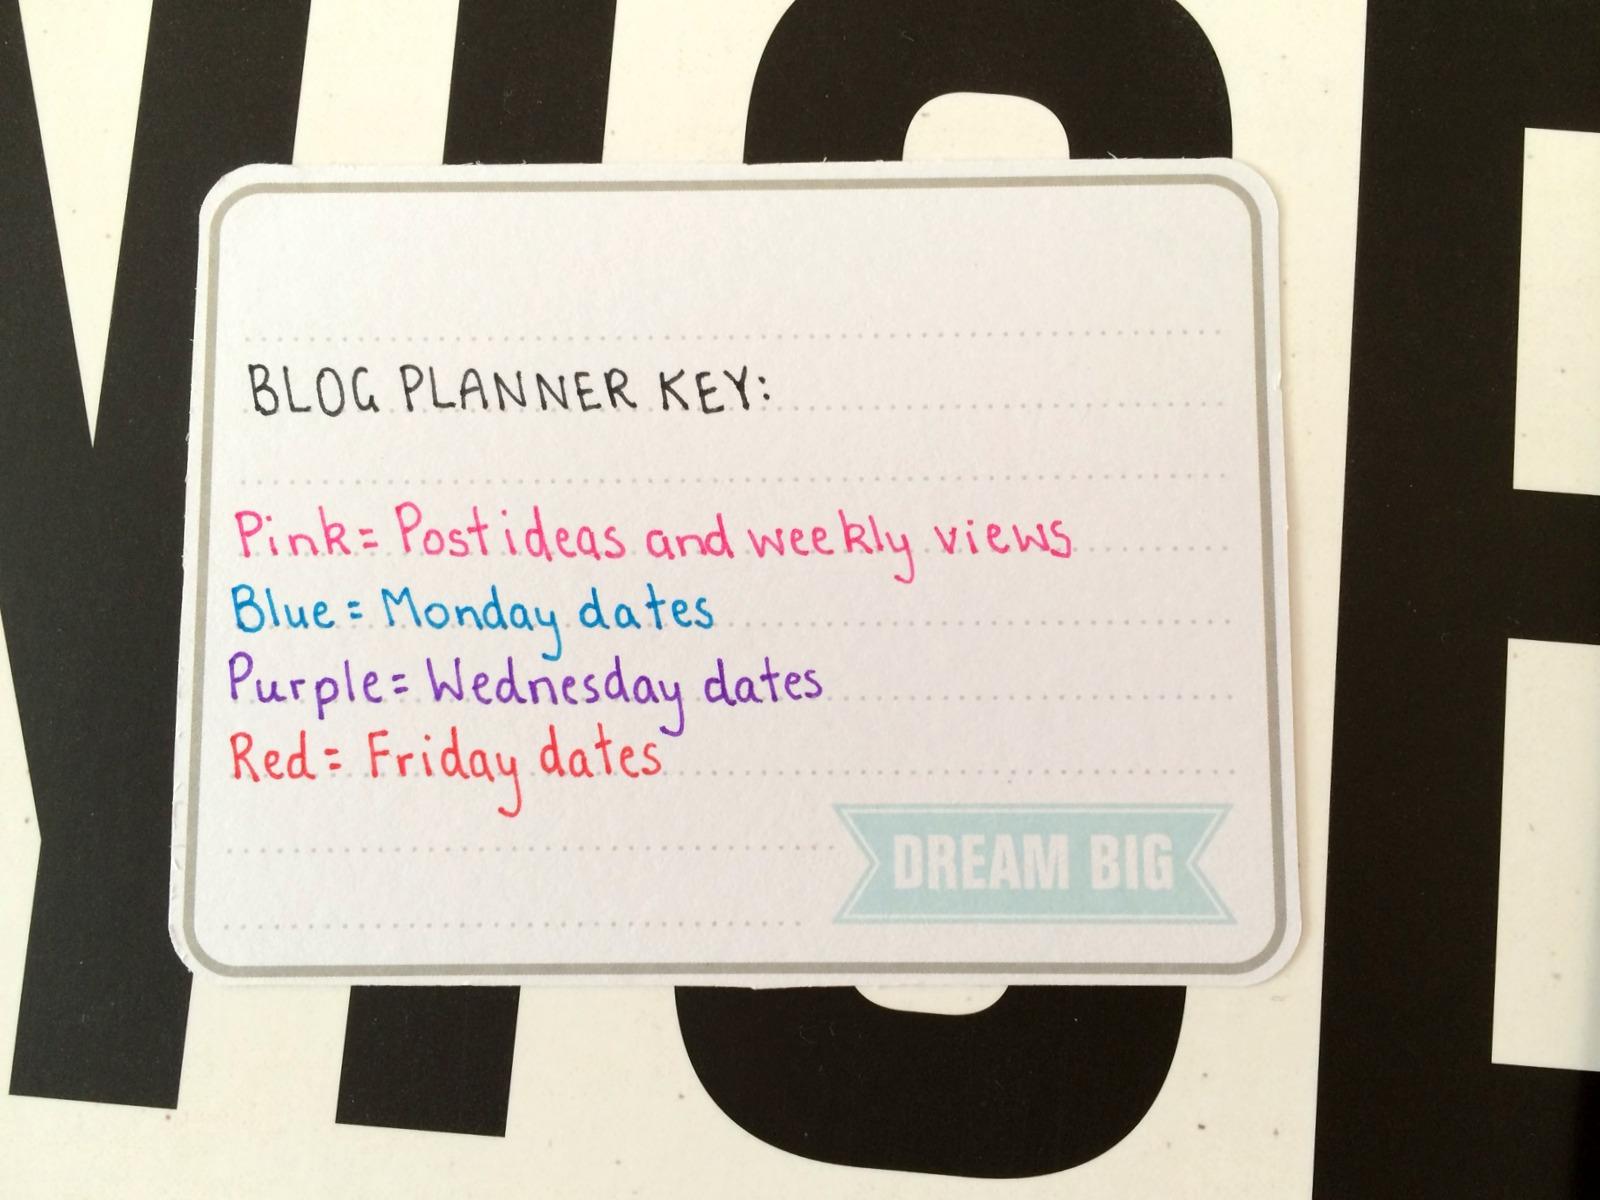 Blog Planner Key